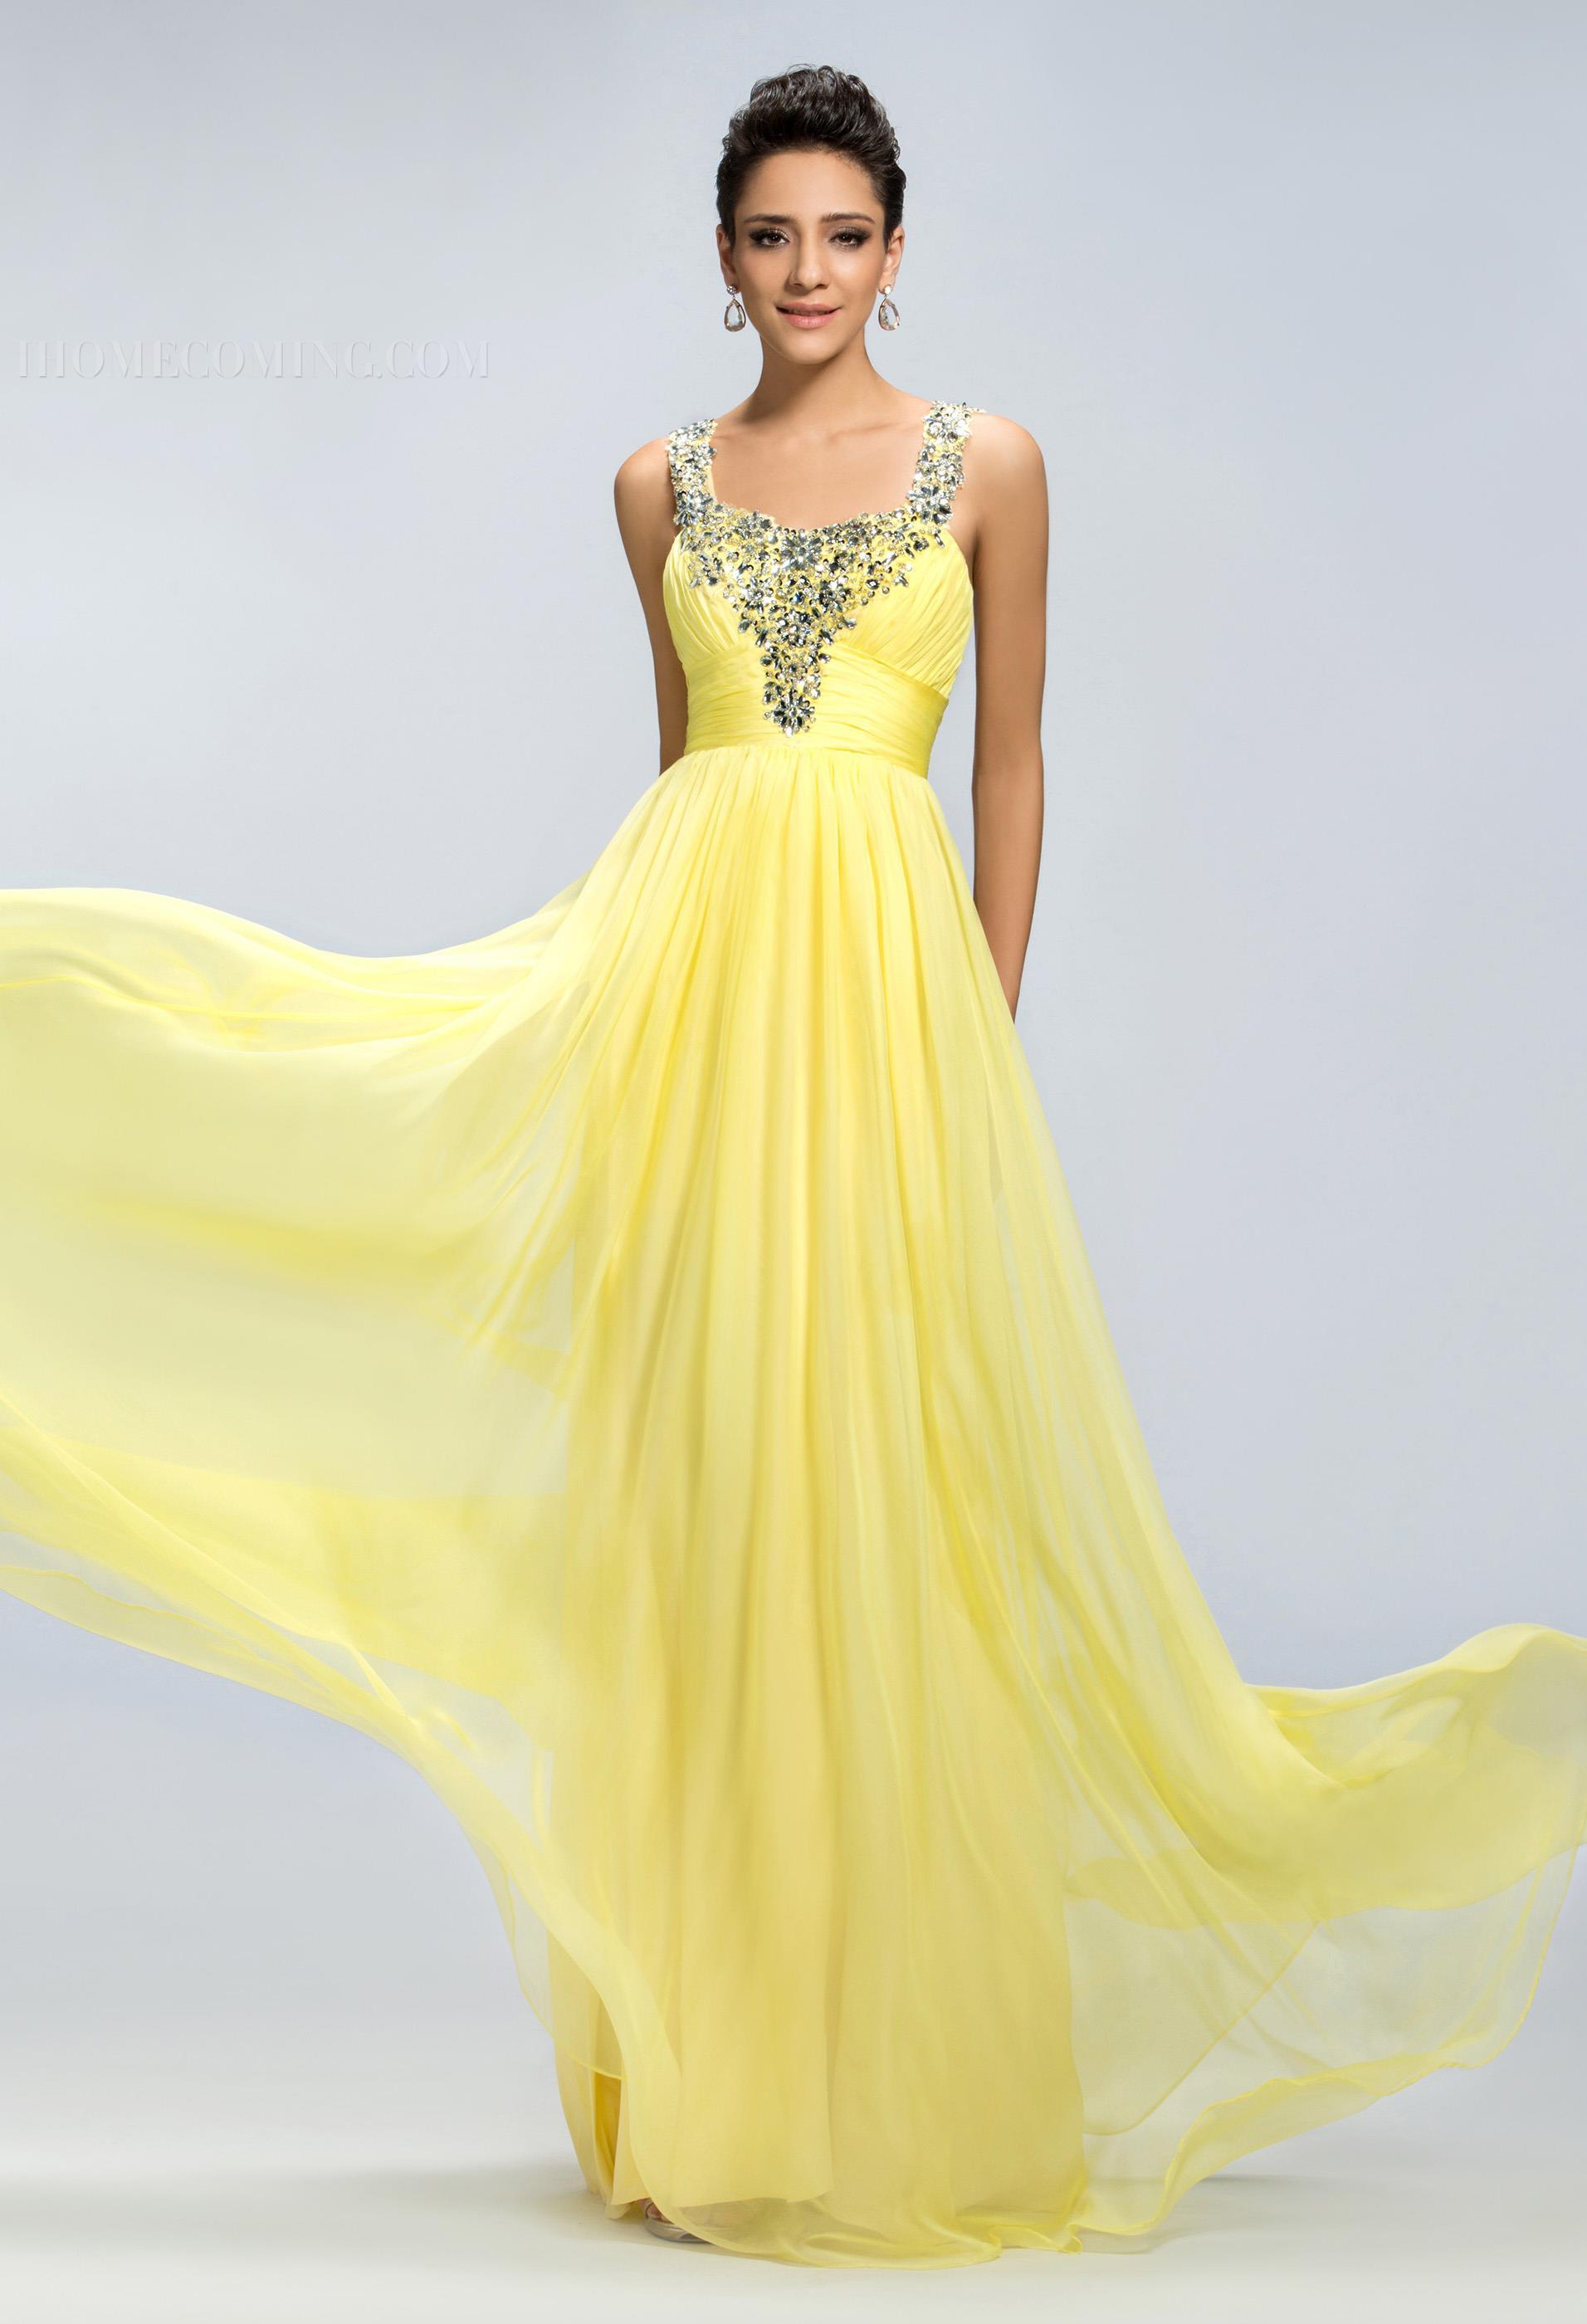 best evening dresses online photo - 1